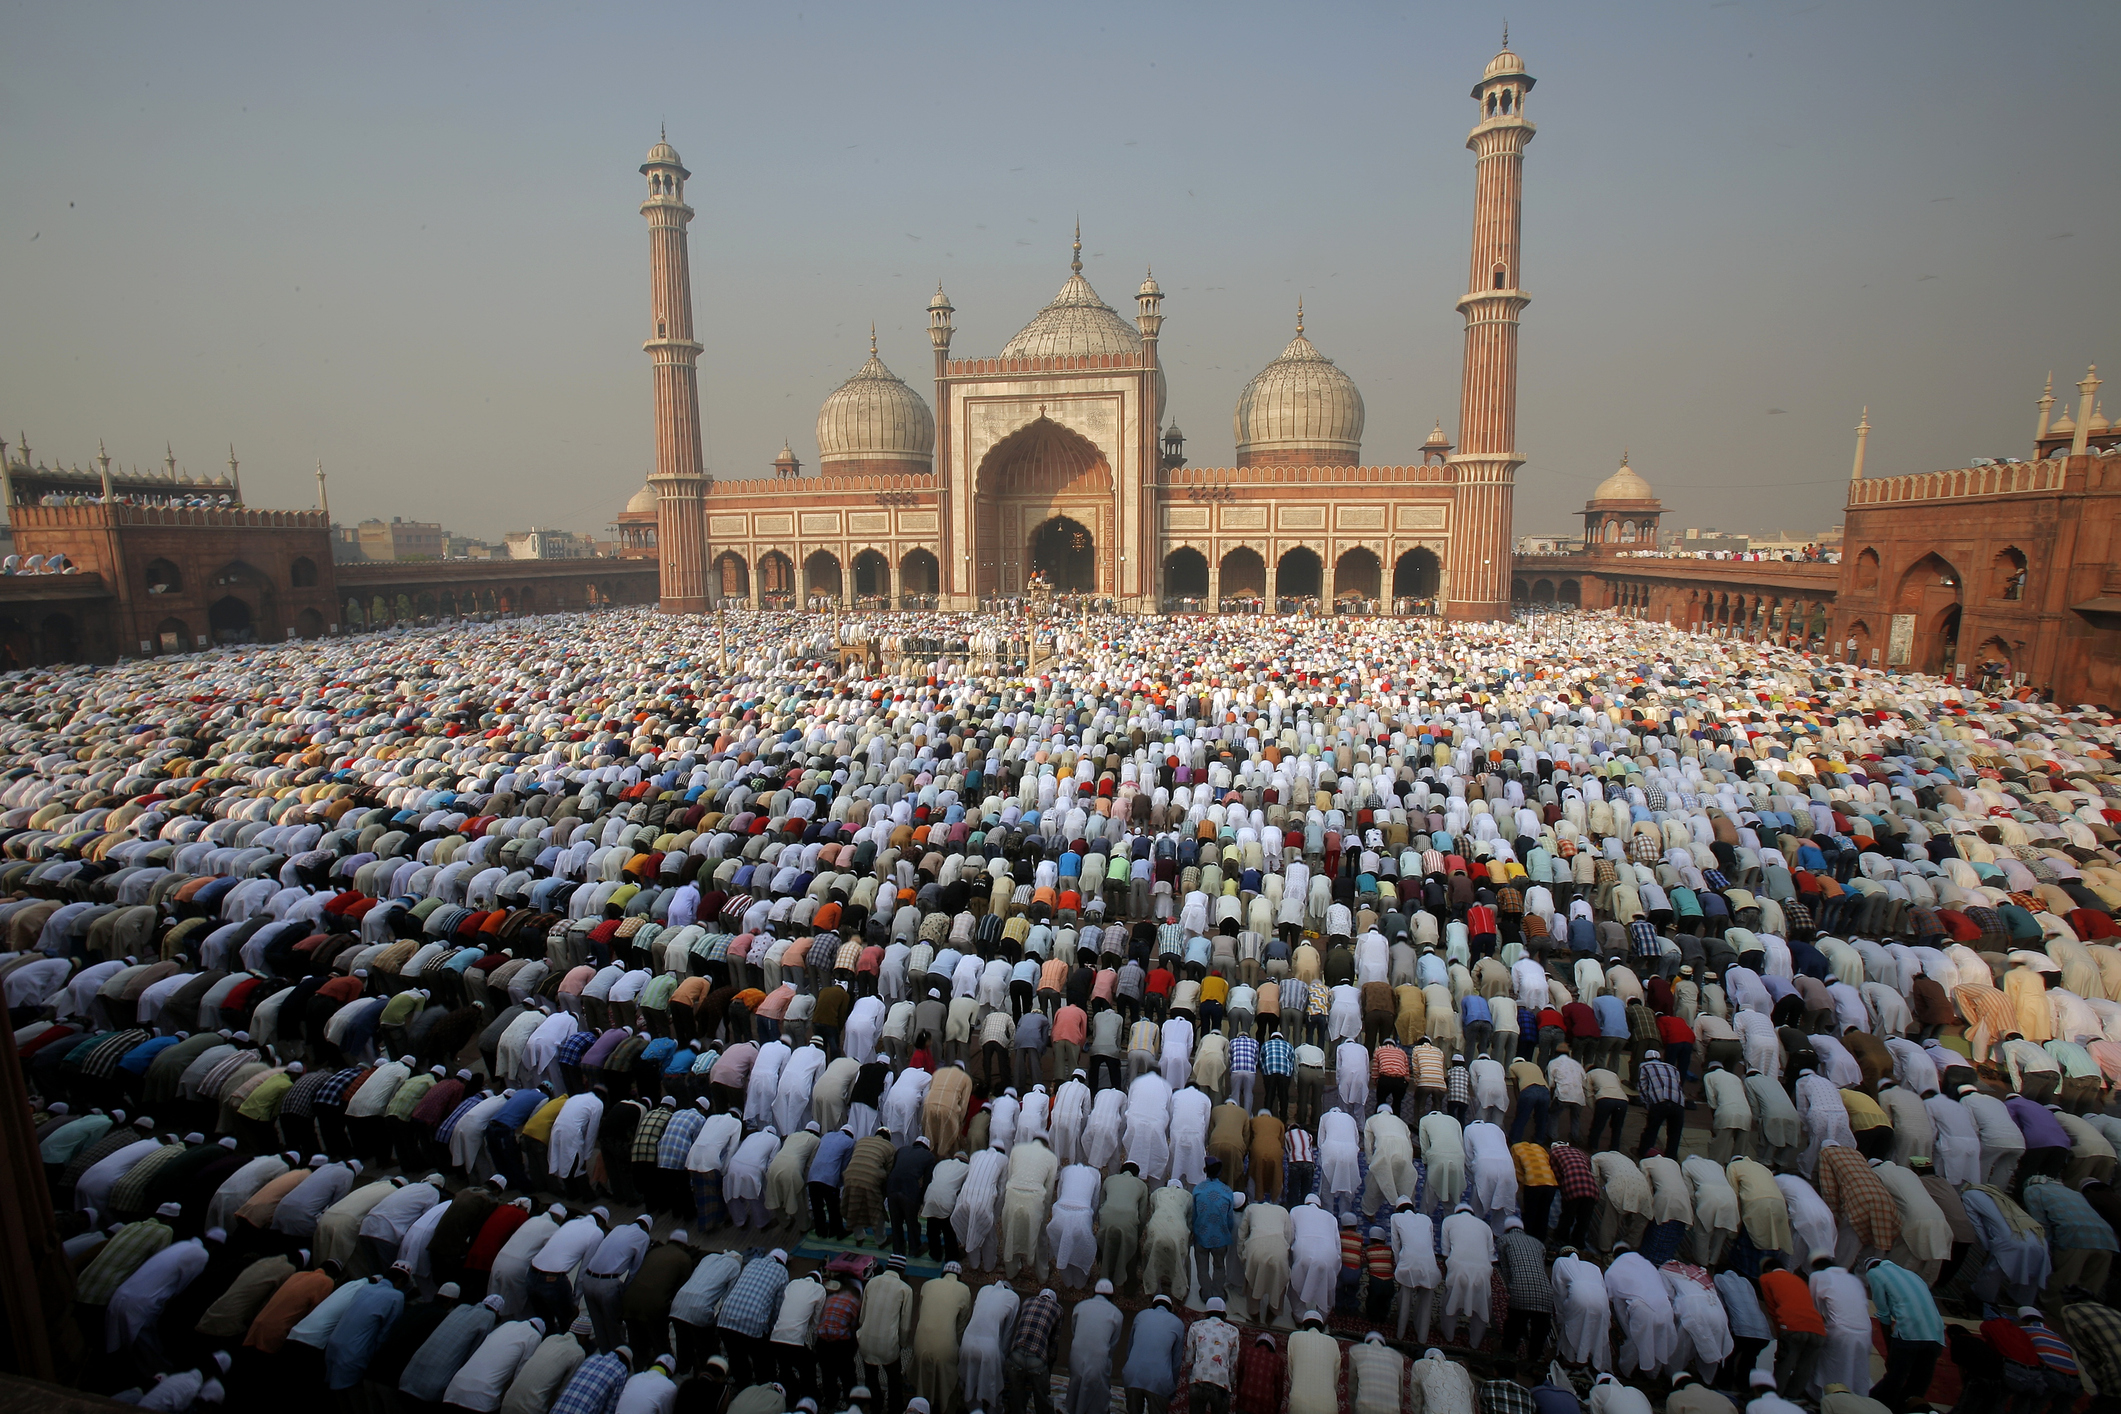 Morning prayers at Jama Masjid mosque in Delhi during Eid festival. India